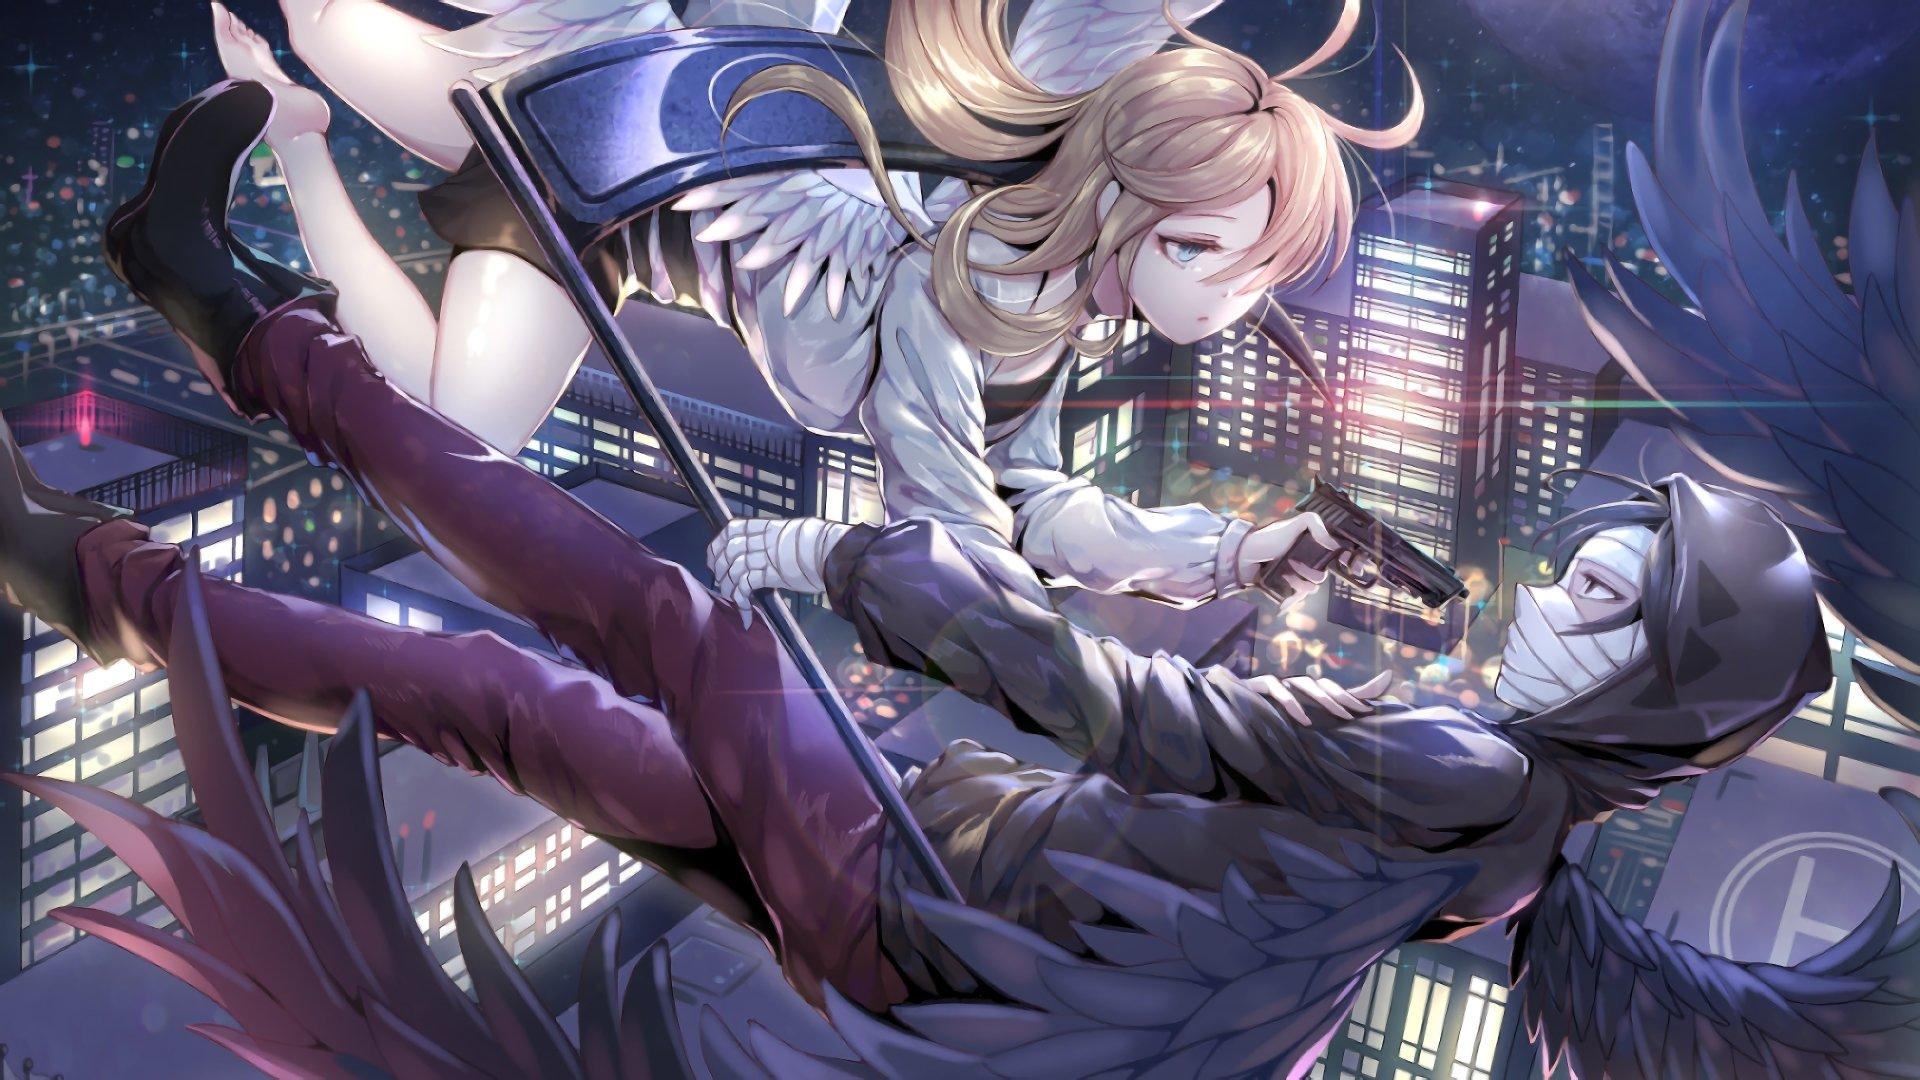 Hd Wallpaper Widescreen Anime 杀戮的天使 4k Ultra 高清壁纸 桌面背景 3840x2160 Id 933208